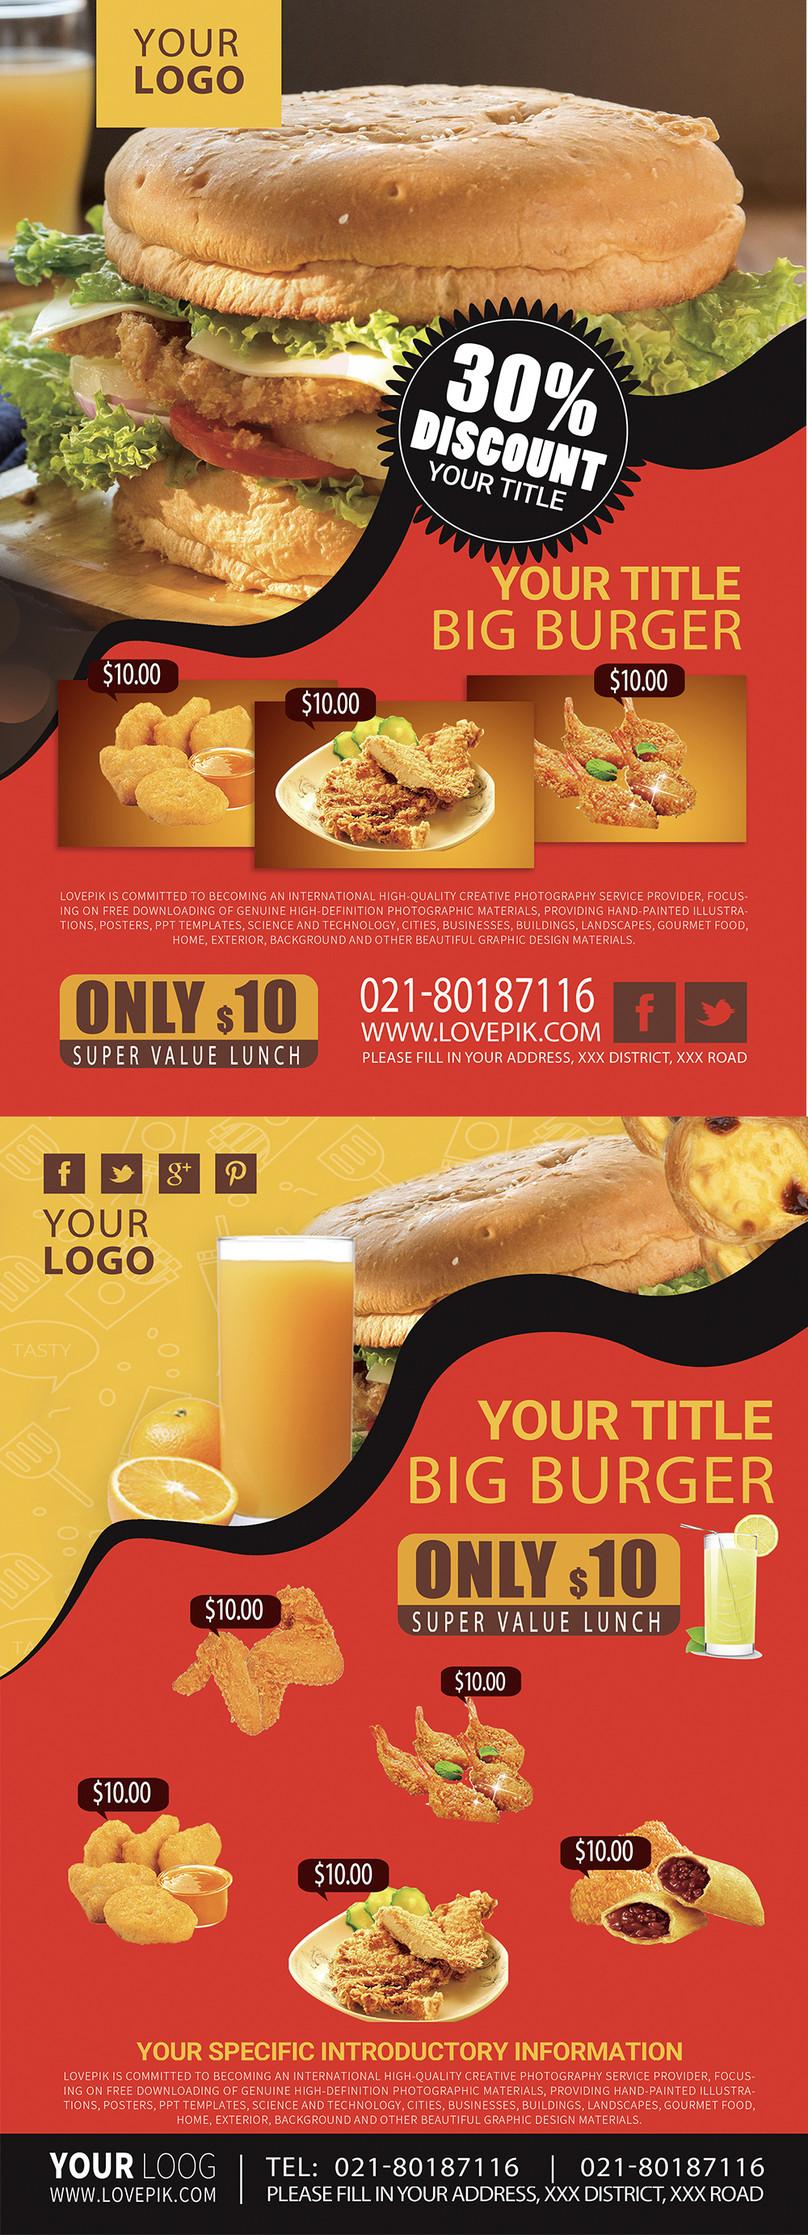 Hamburguesa Comida Flyer Ingles Imagen Descargar Prf Plantillas